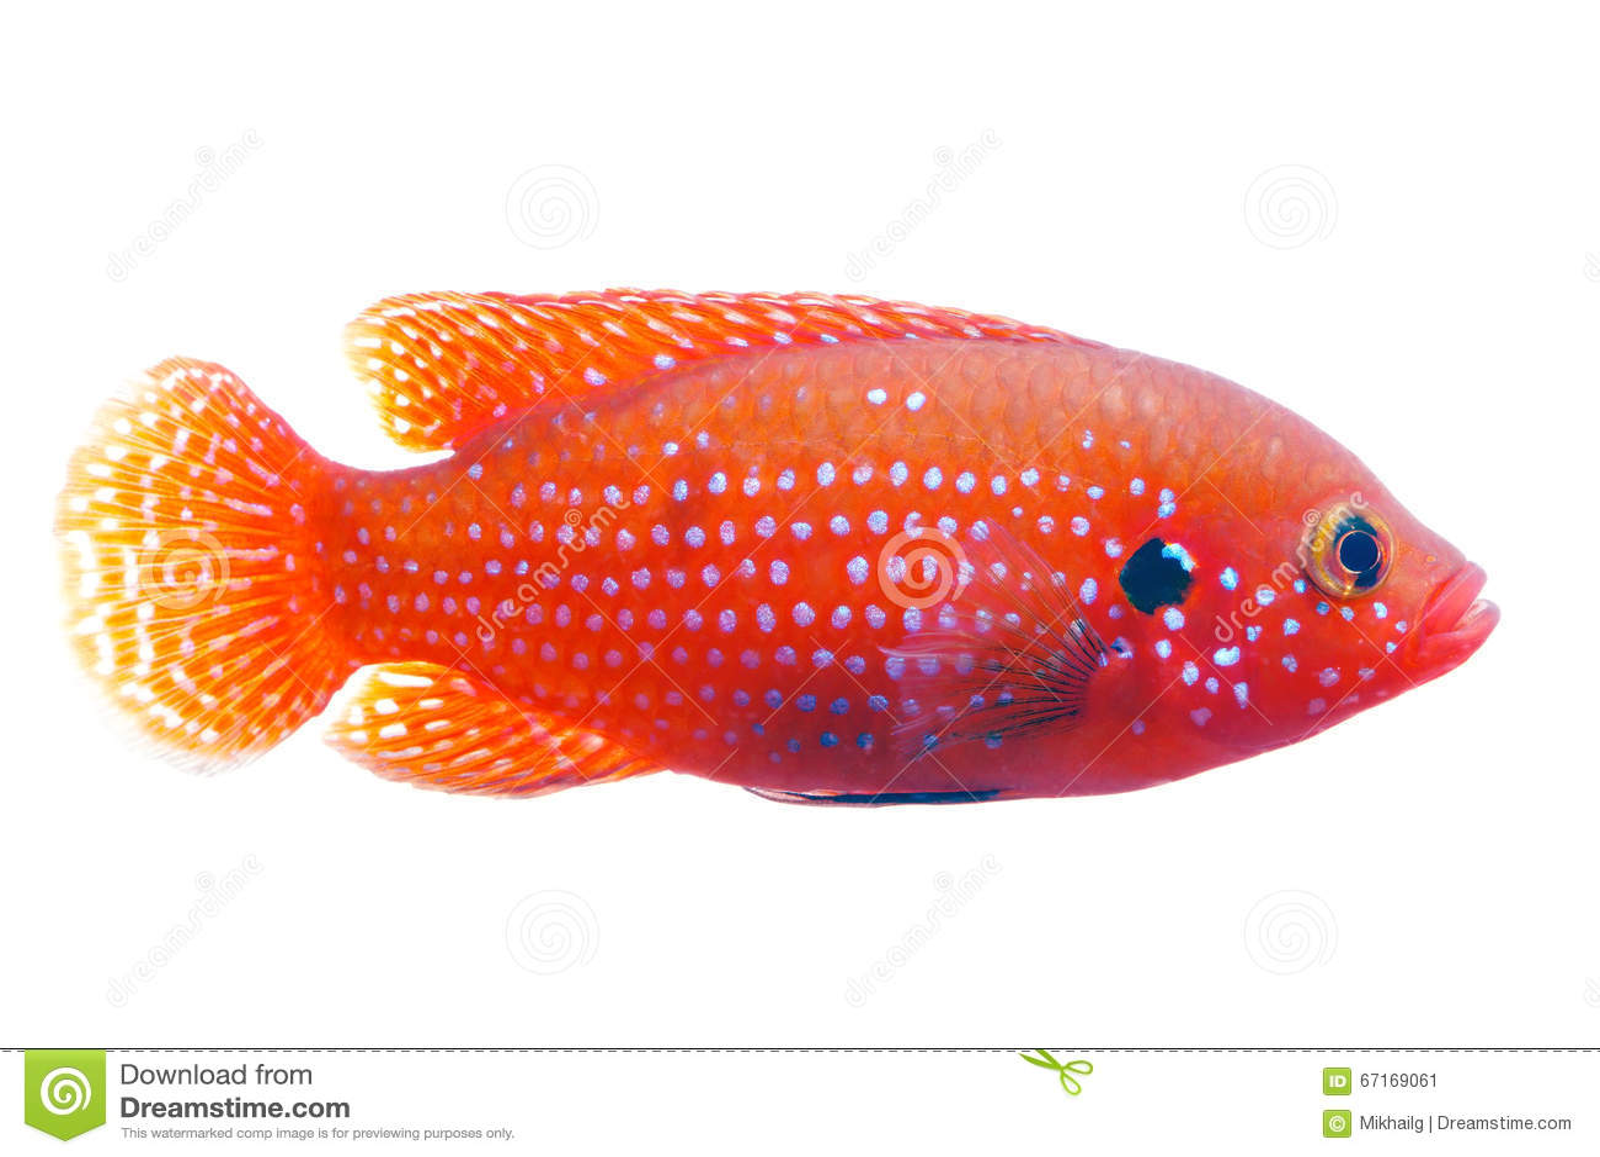 Freshwater jewel fish - African Jewelfish